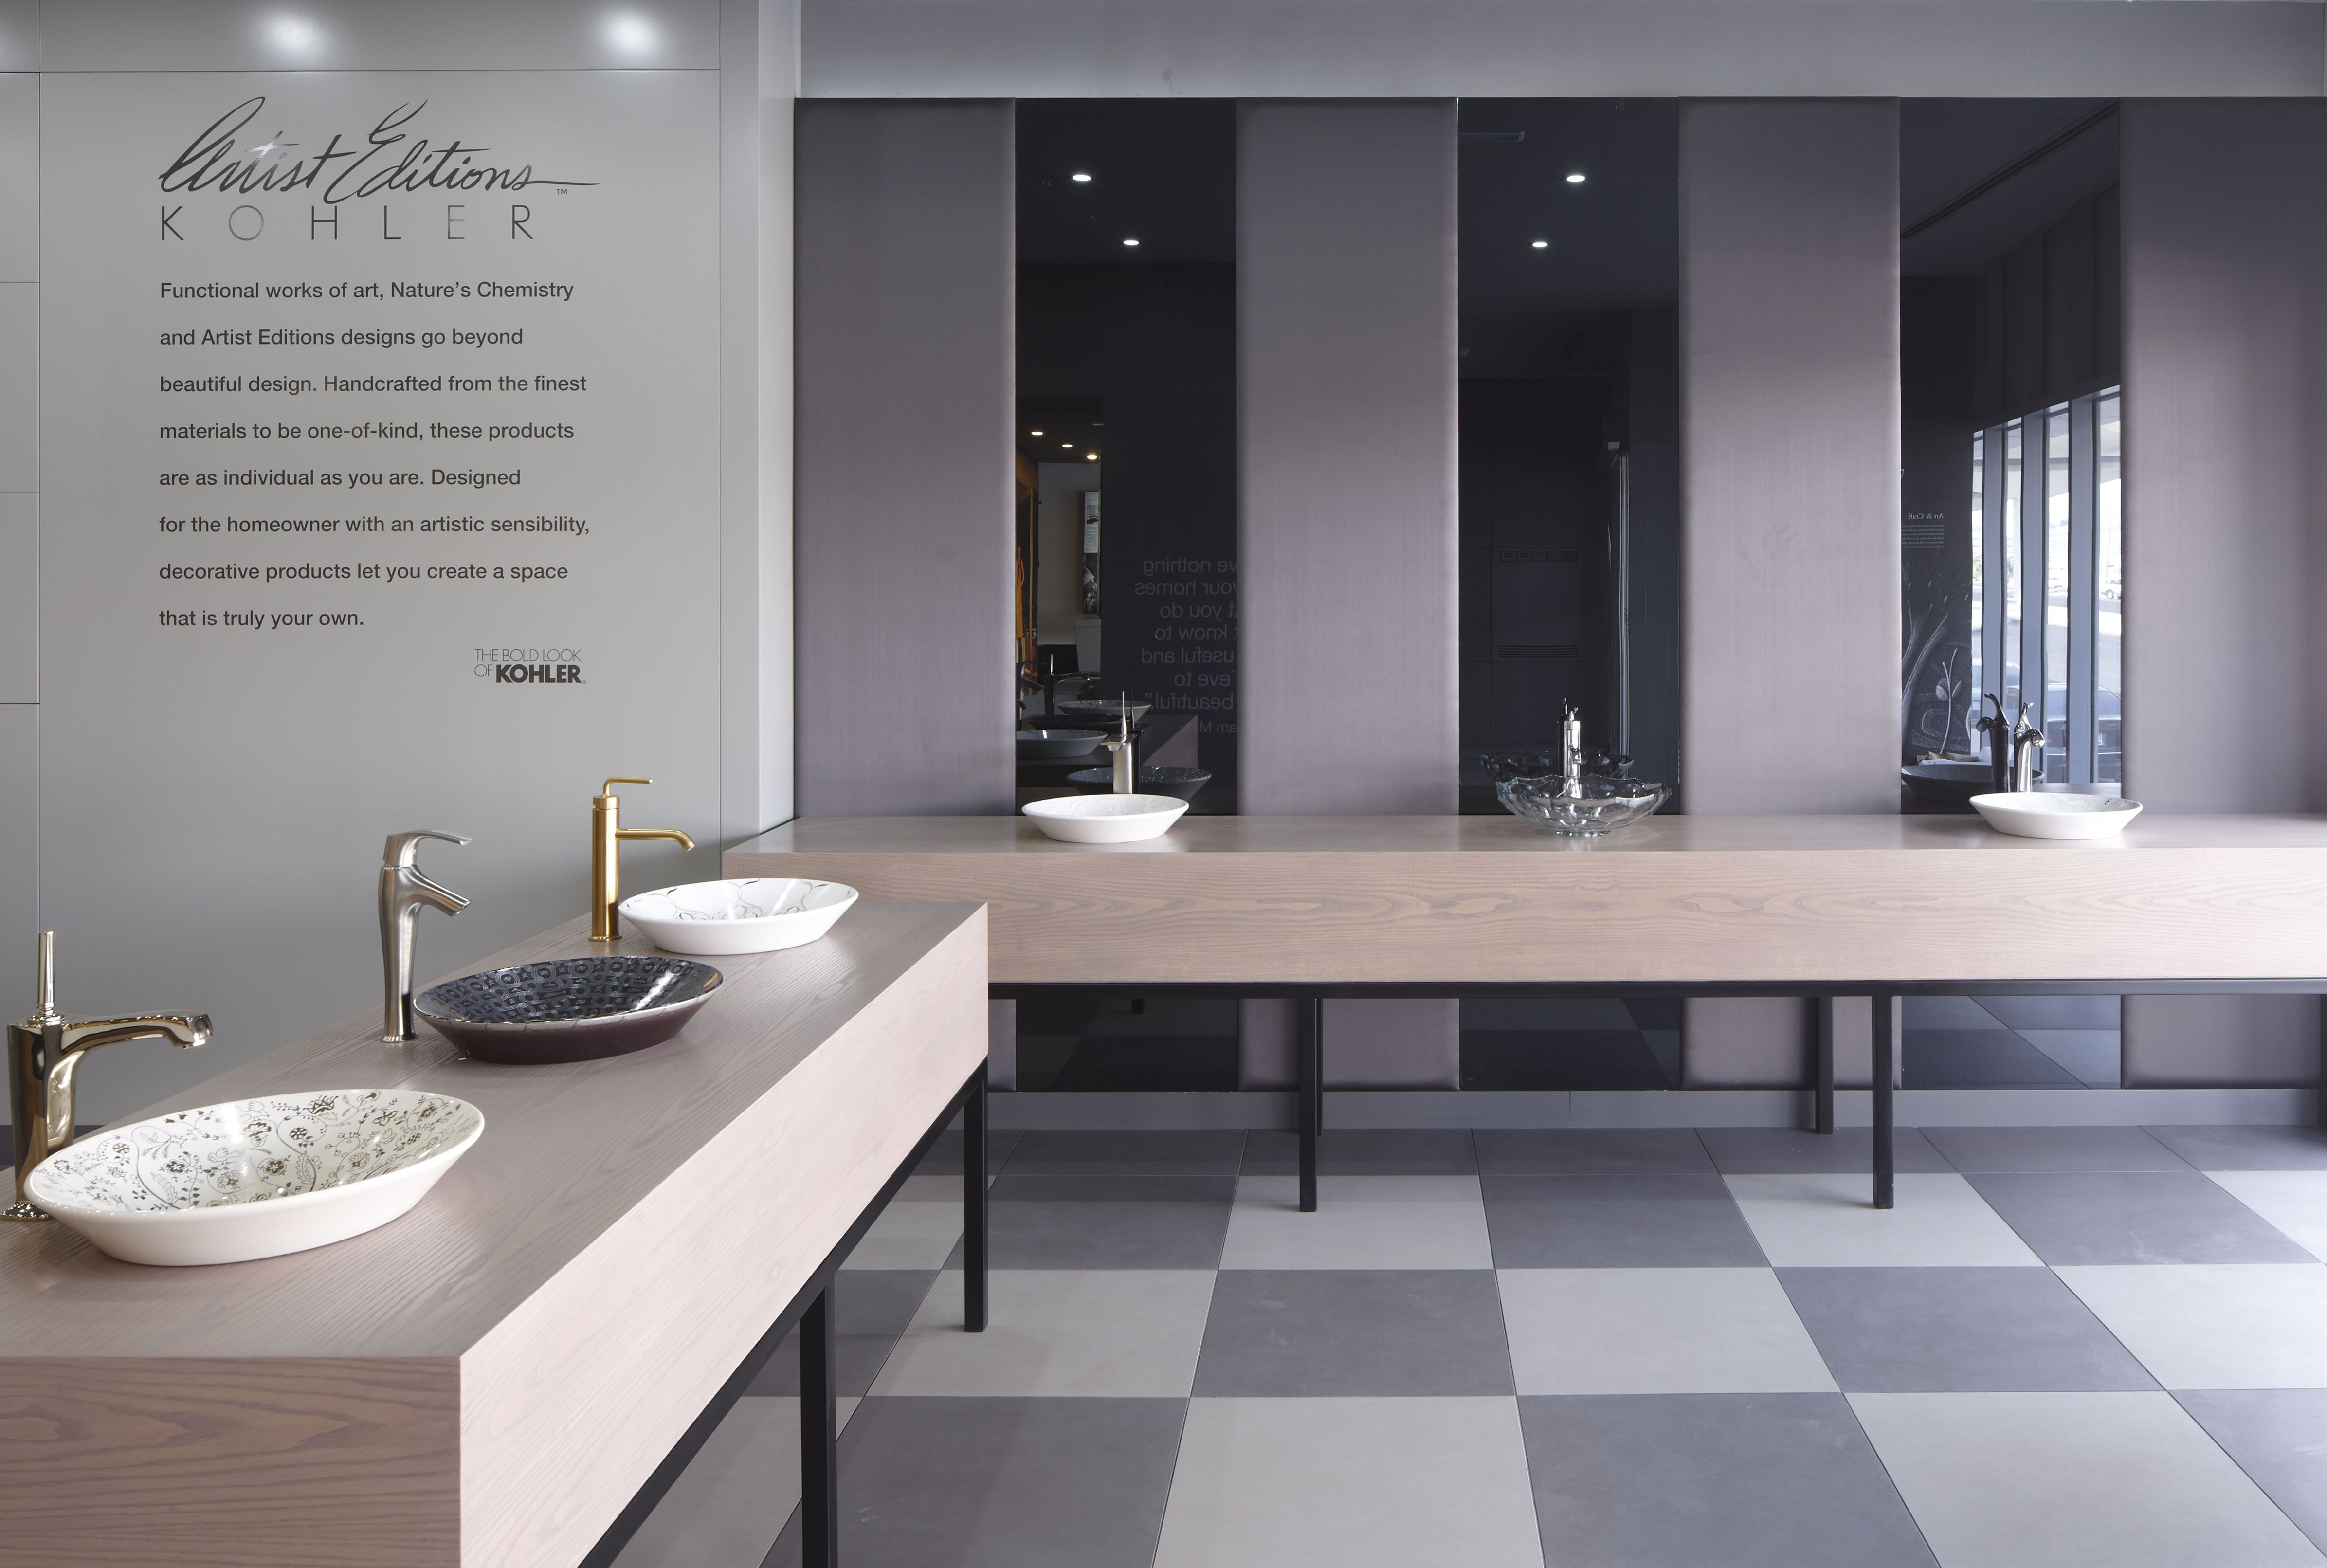 Kohler Kitchen And Bath Showroom In Dubai By Www.m Ap.com